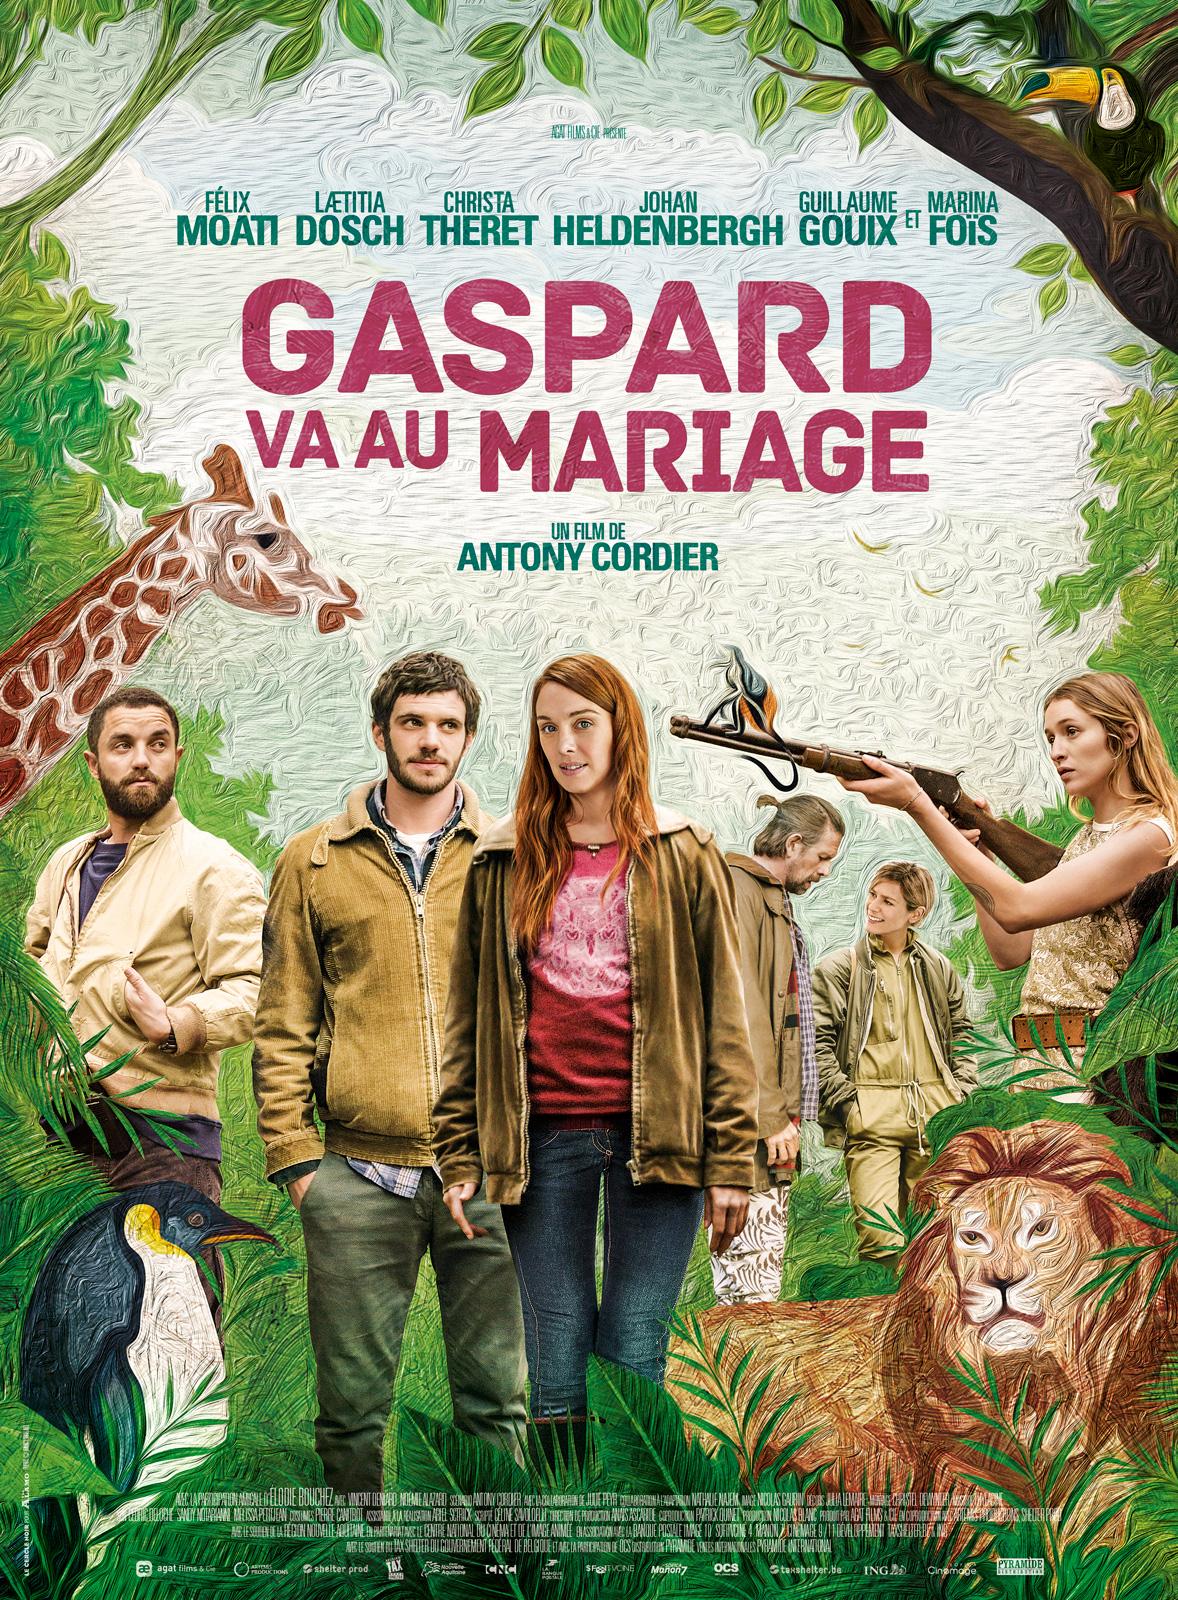 Image du film Gaspard va au mariage